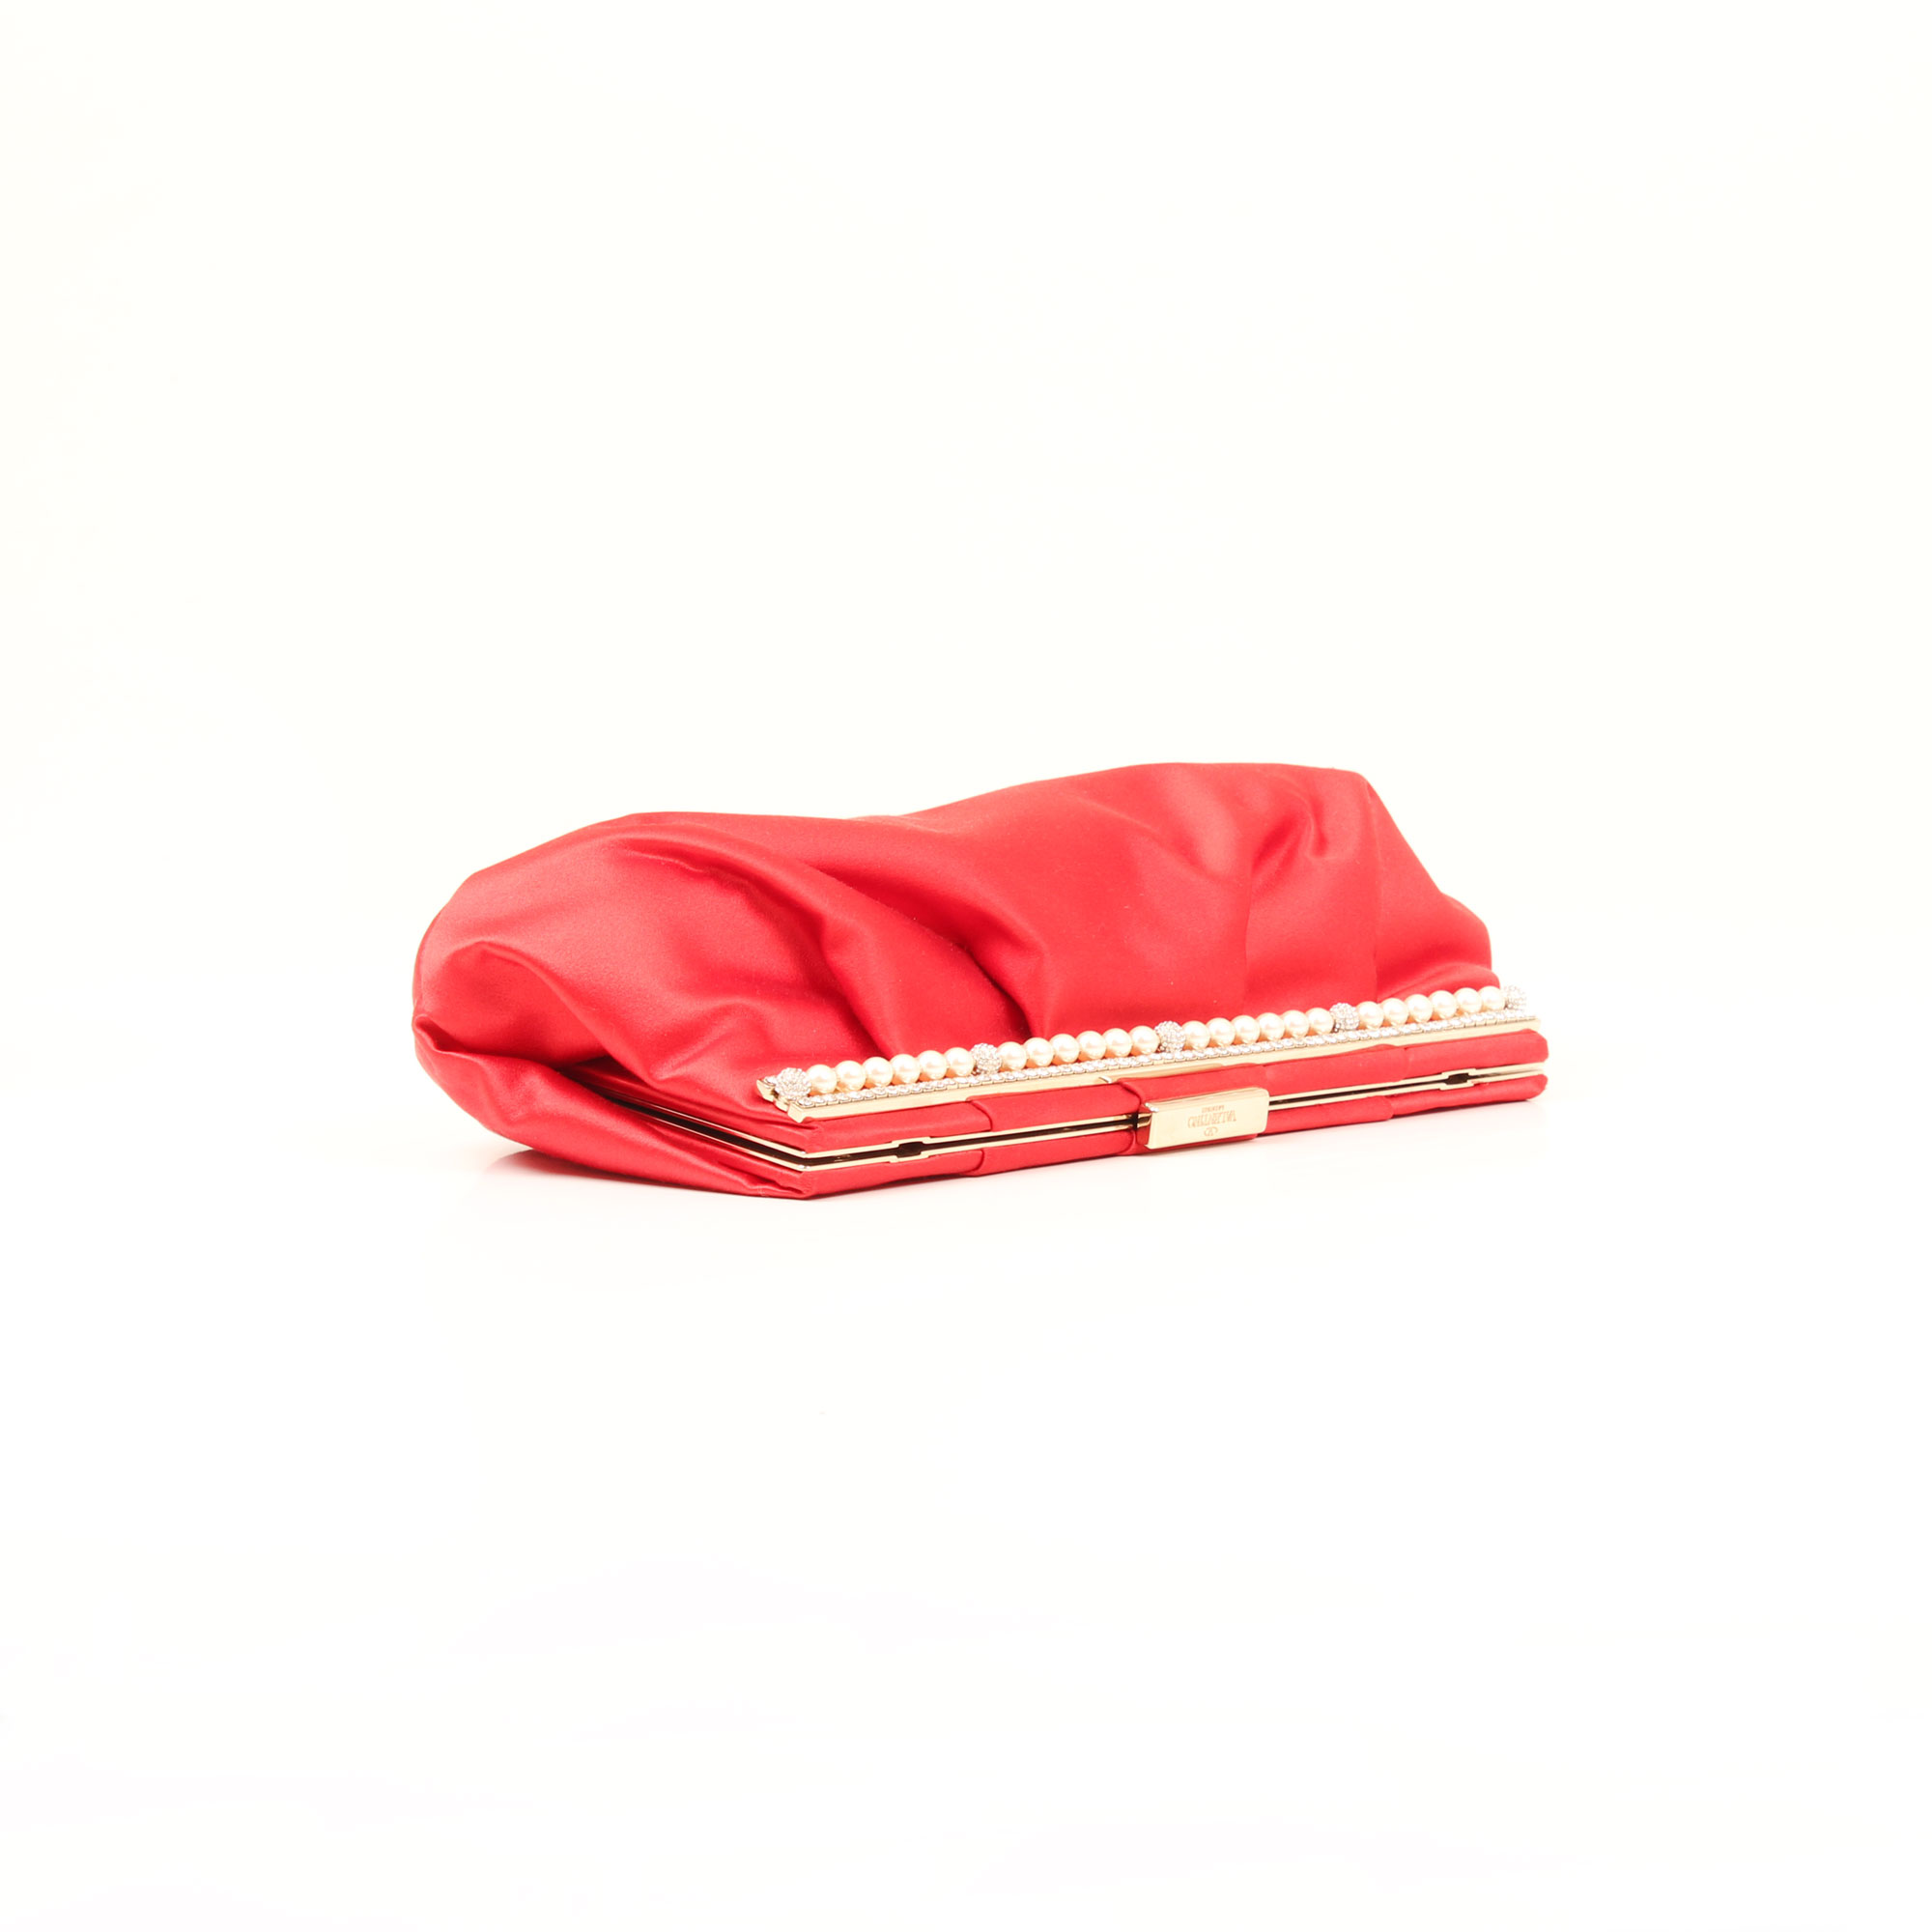 bolso-clutch-valentino-rojo-saten-general